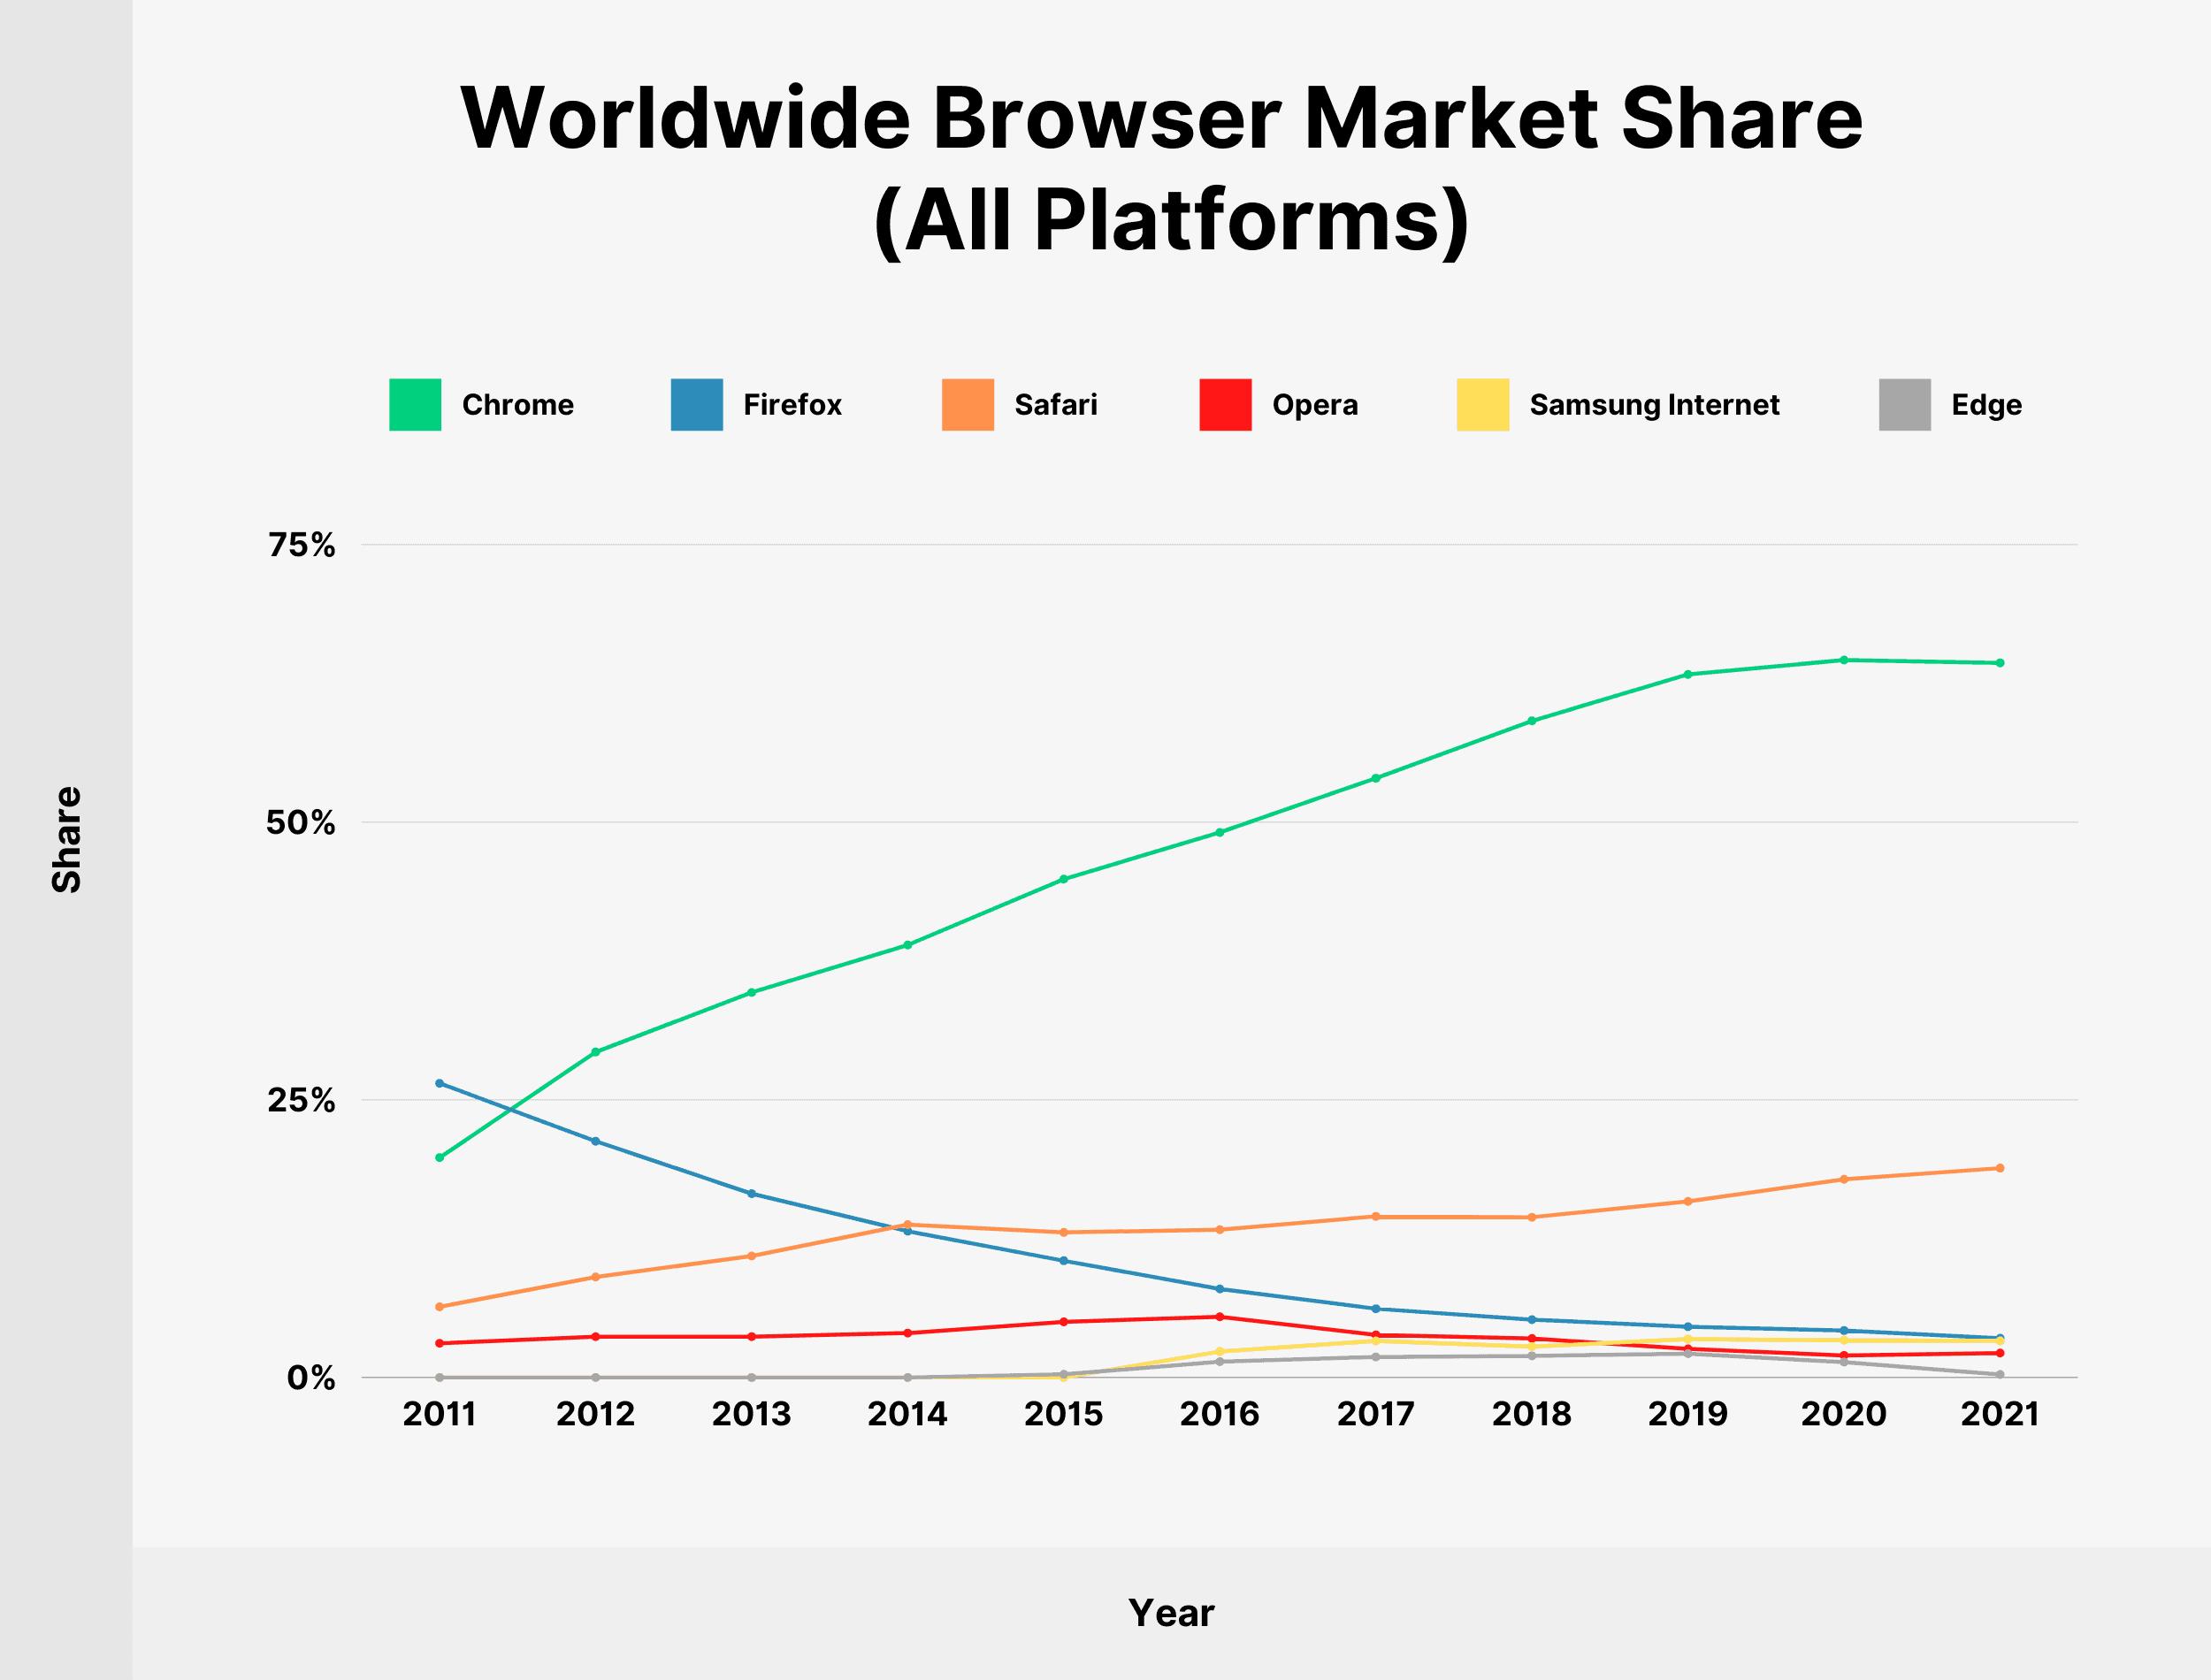 Worldwide Browser Market Share (All Platforms)